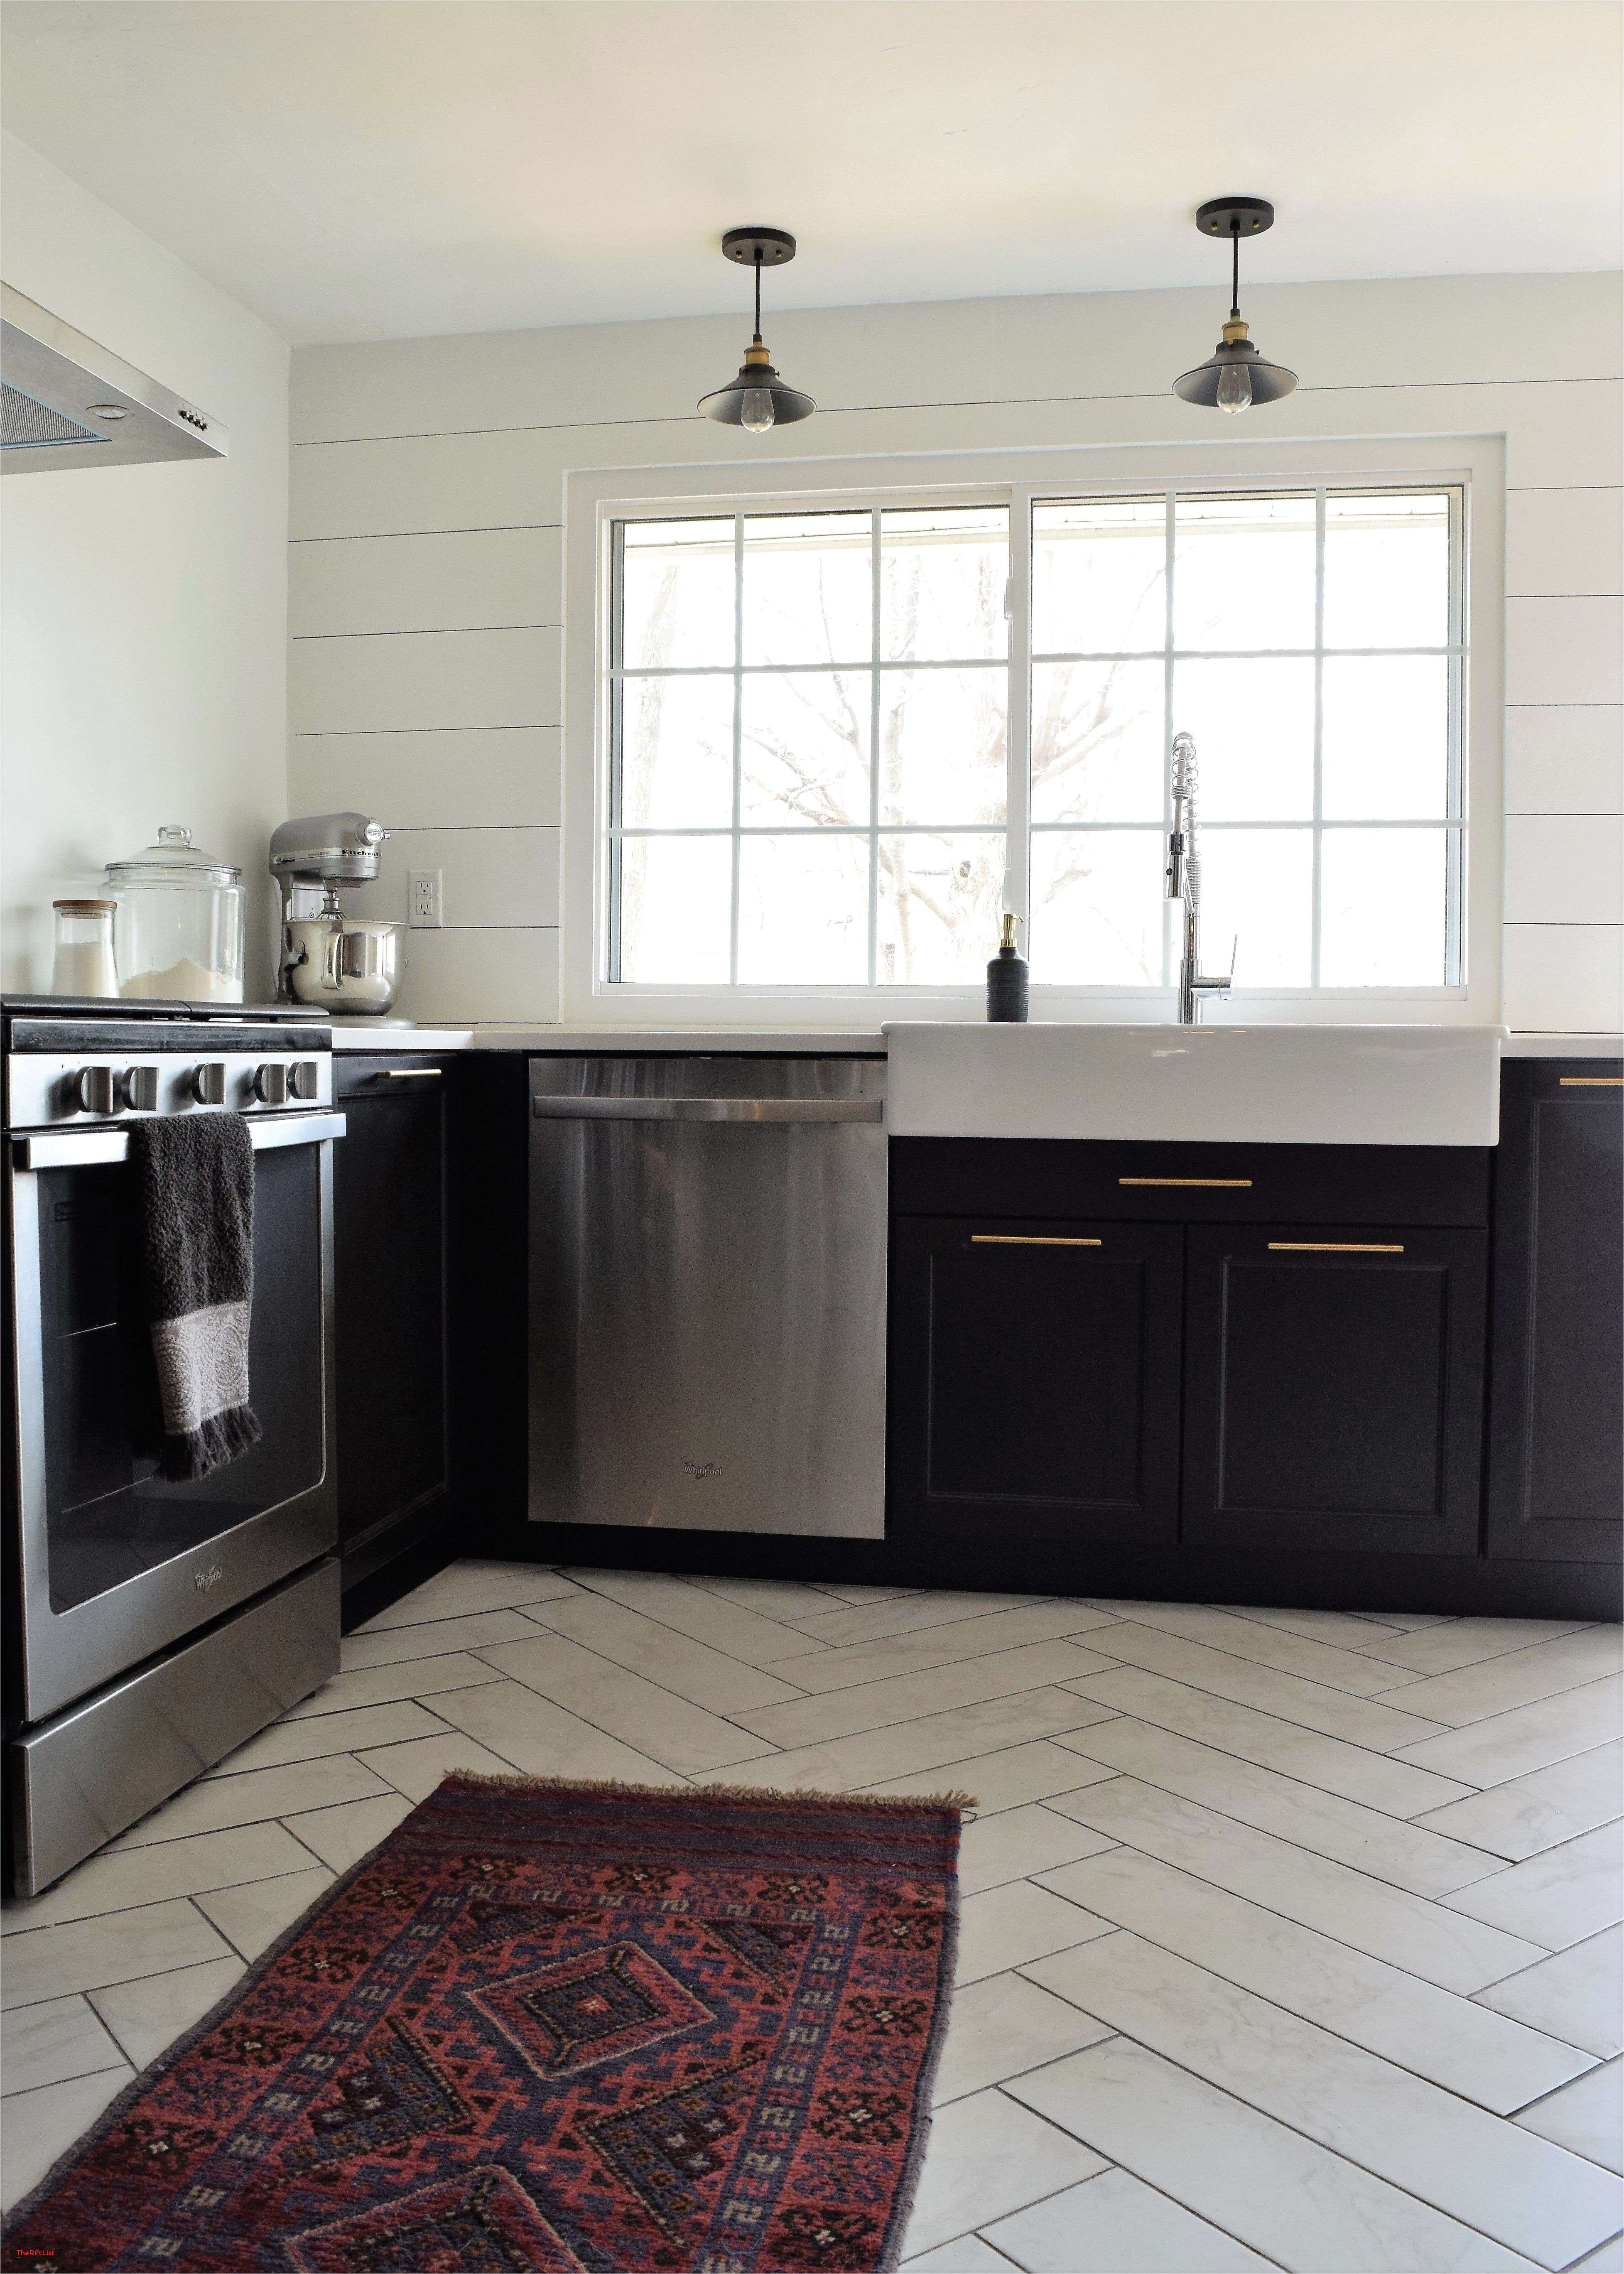 Kitchen Cabinet Lighting – Wonderful Exclusive Kitchen Designs Alluring Kitchen Cabinet 0d Bright Lights